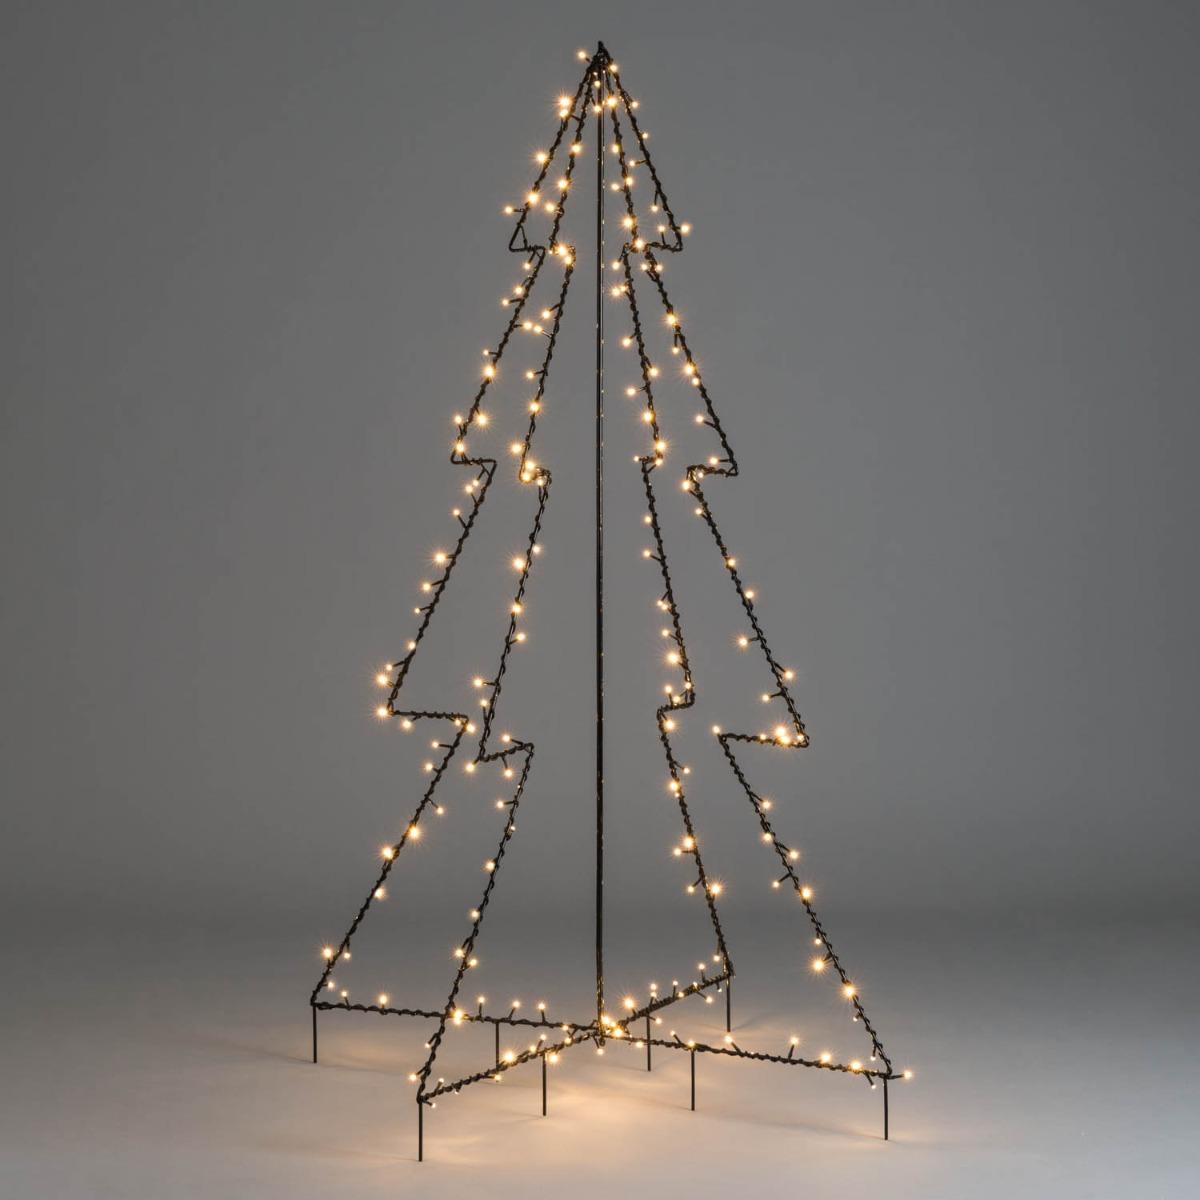 Image of Black Silhouette Christmas Tree 5ft